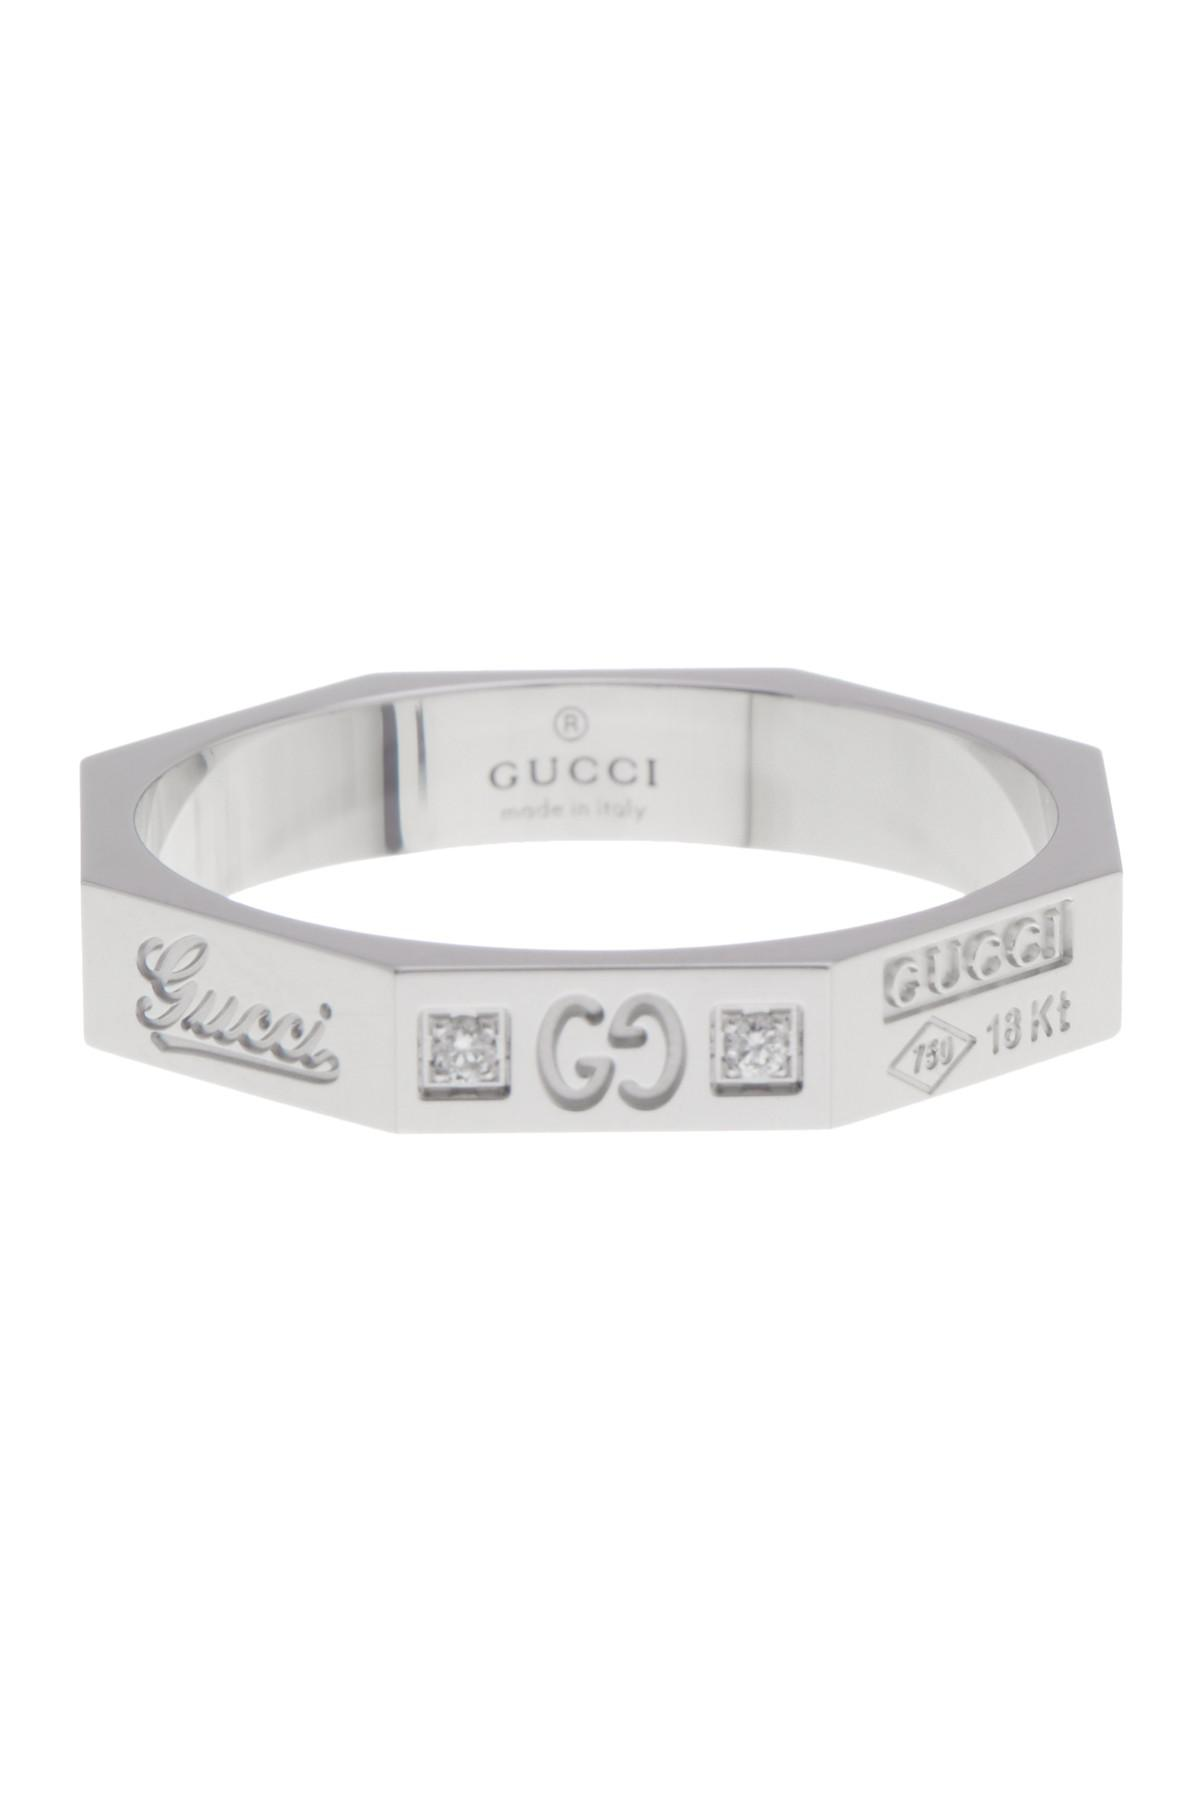 ae64f6ab7 Gucci 18k White Gold Otto Diamond & Logo Geo Band Ring - Size 8 in ...